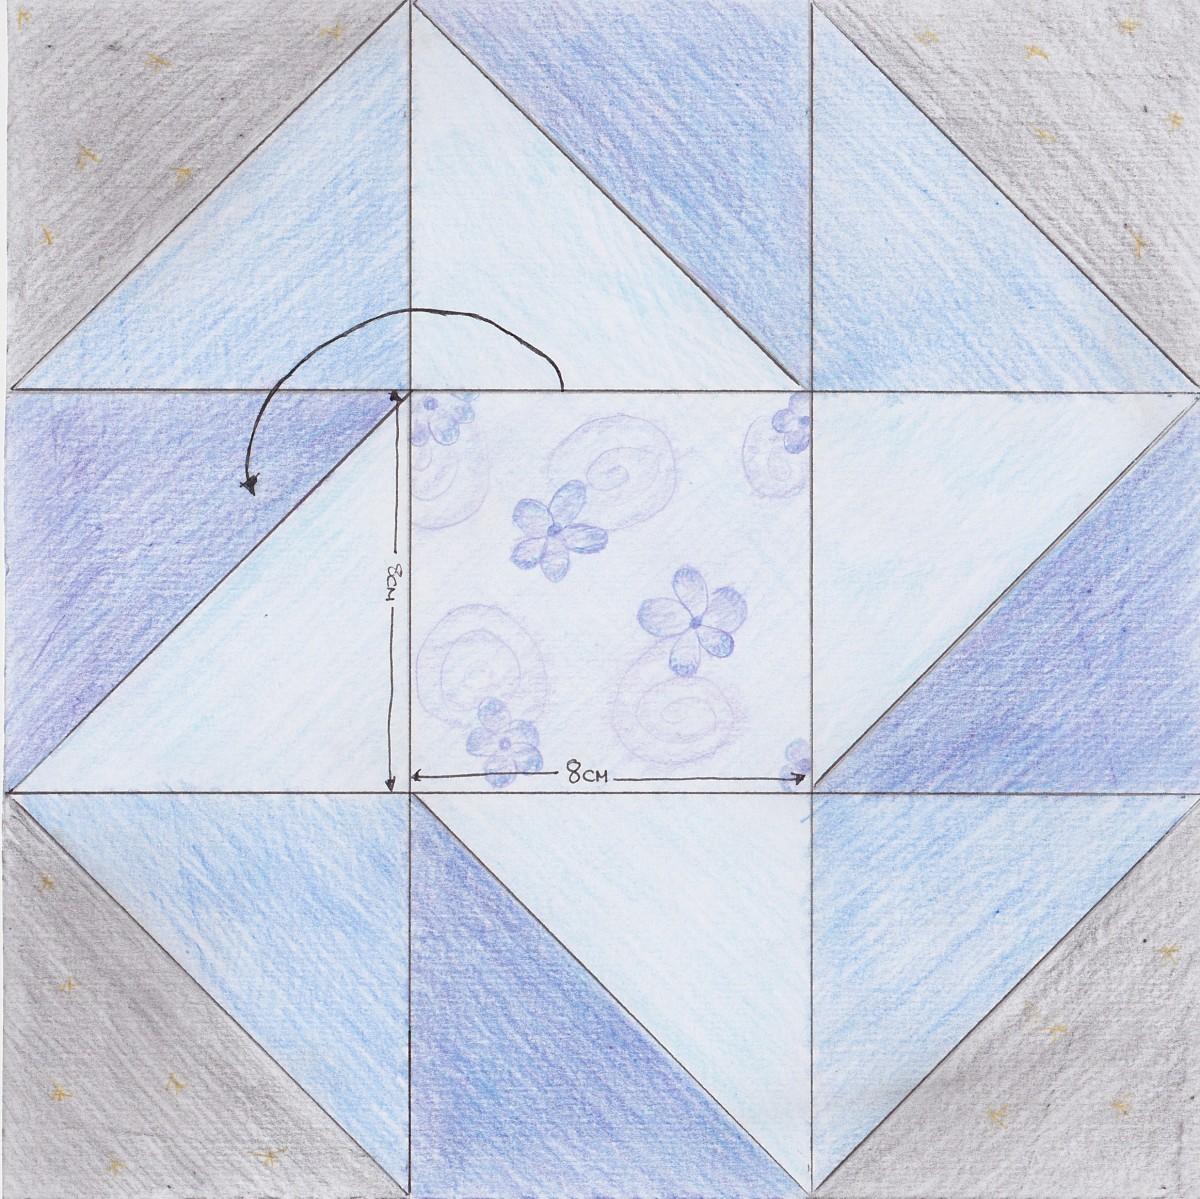 My quilt block design - color